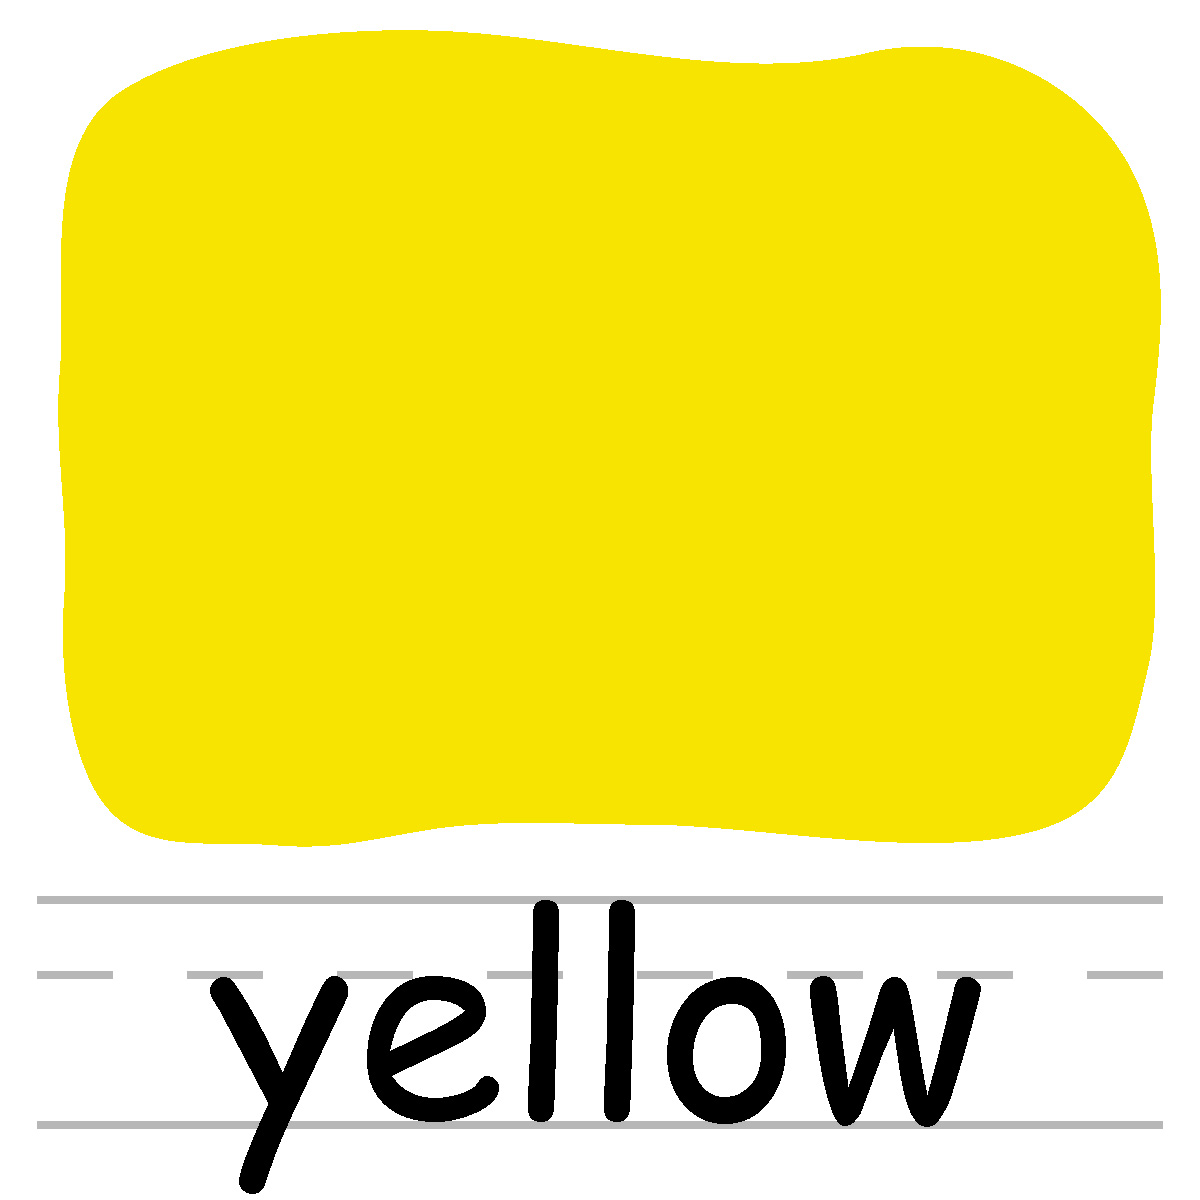 Yellow clipart #5